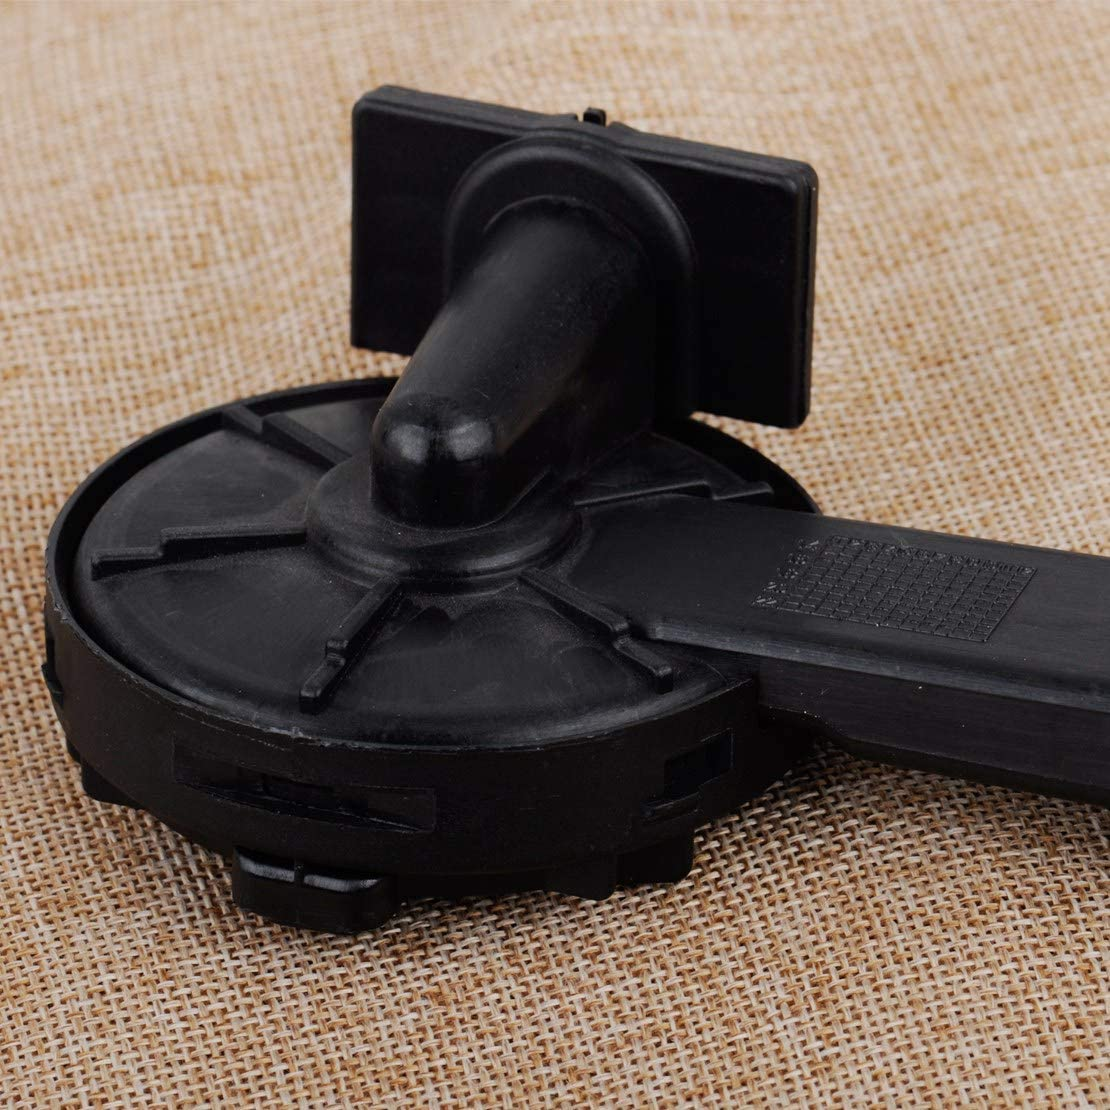 SODIAL Engine Valve Camshaft Rocker,55558118,55558673,55564395 For Chevrolet Aveo Cruze Sonic Pontiac G3 Saturn Astra